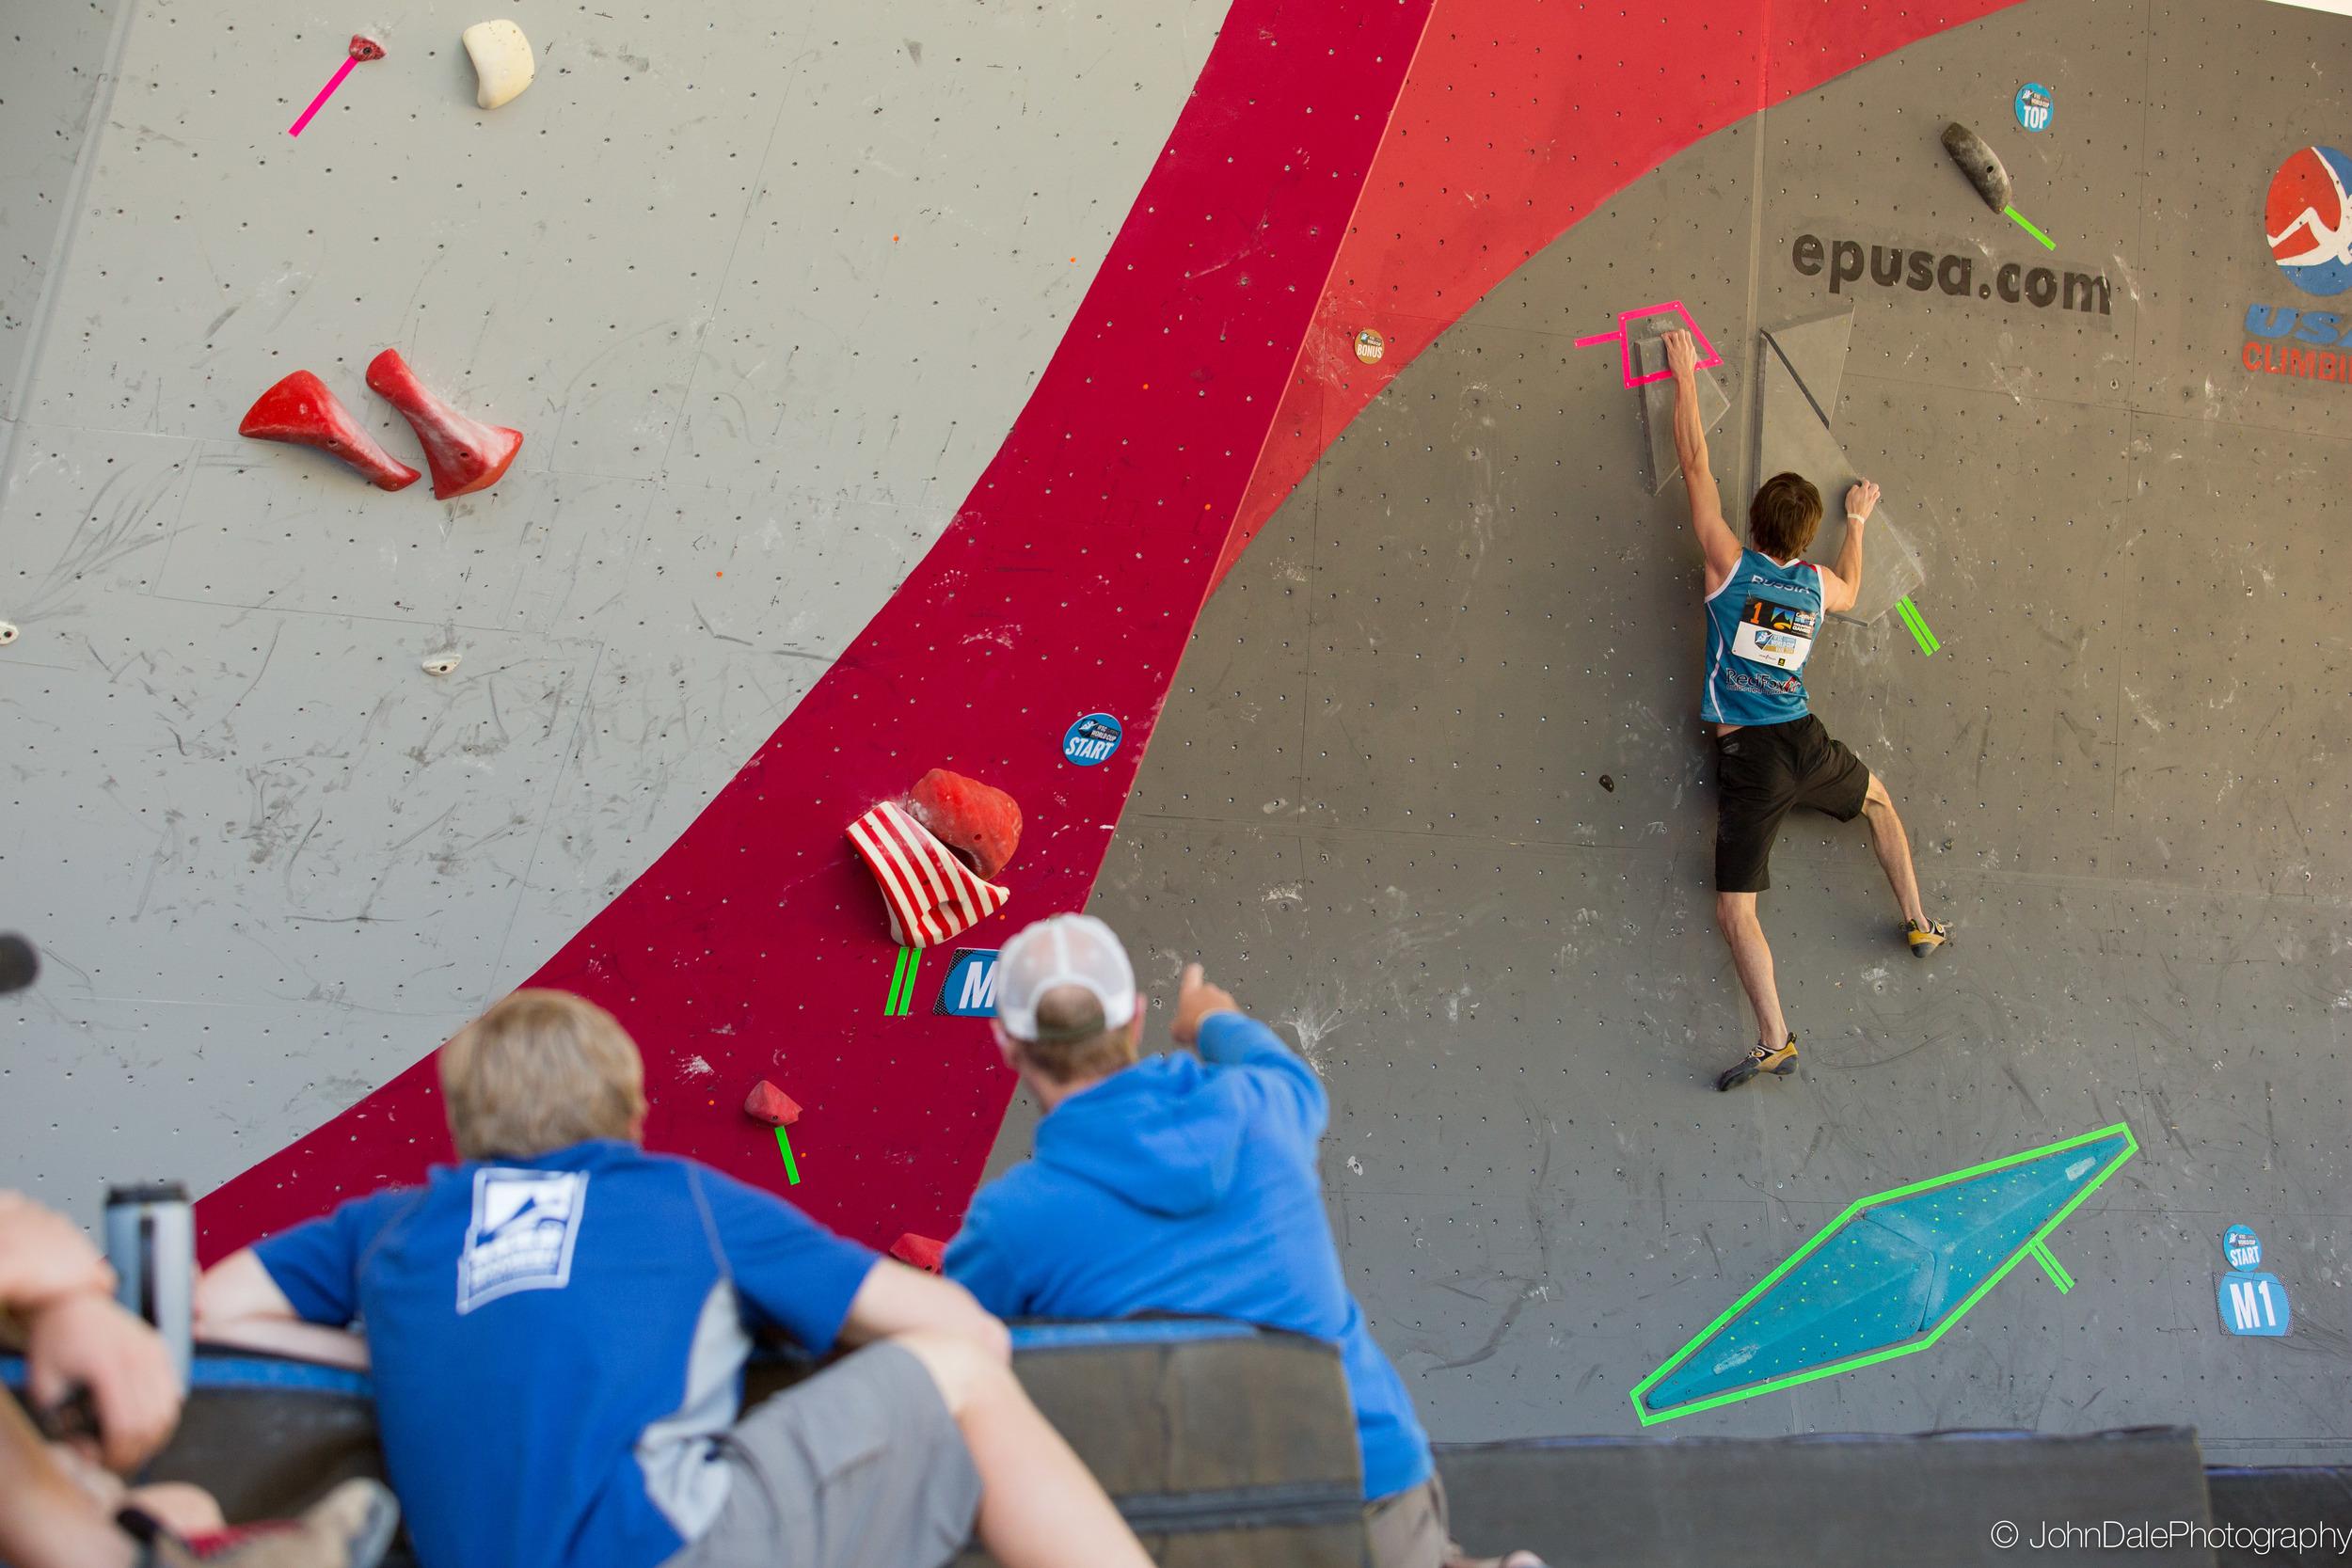 Climbing at the 2014 GoPro Mountain Games-1.jpg